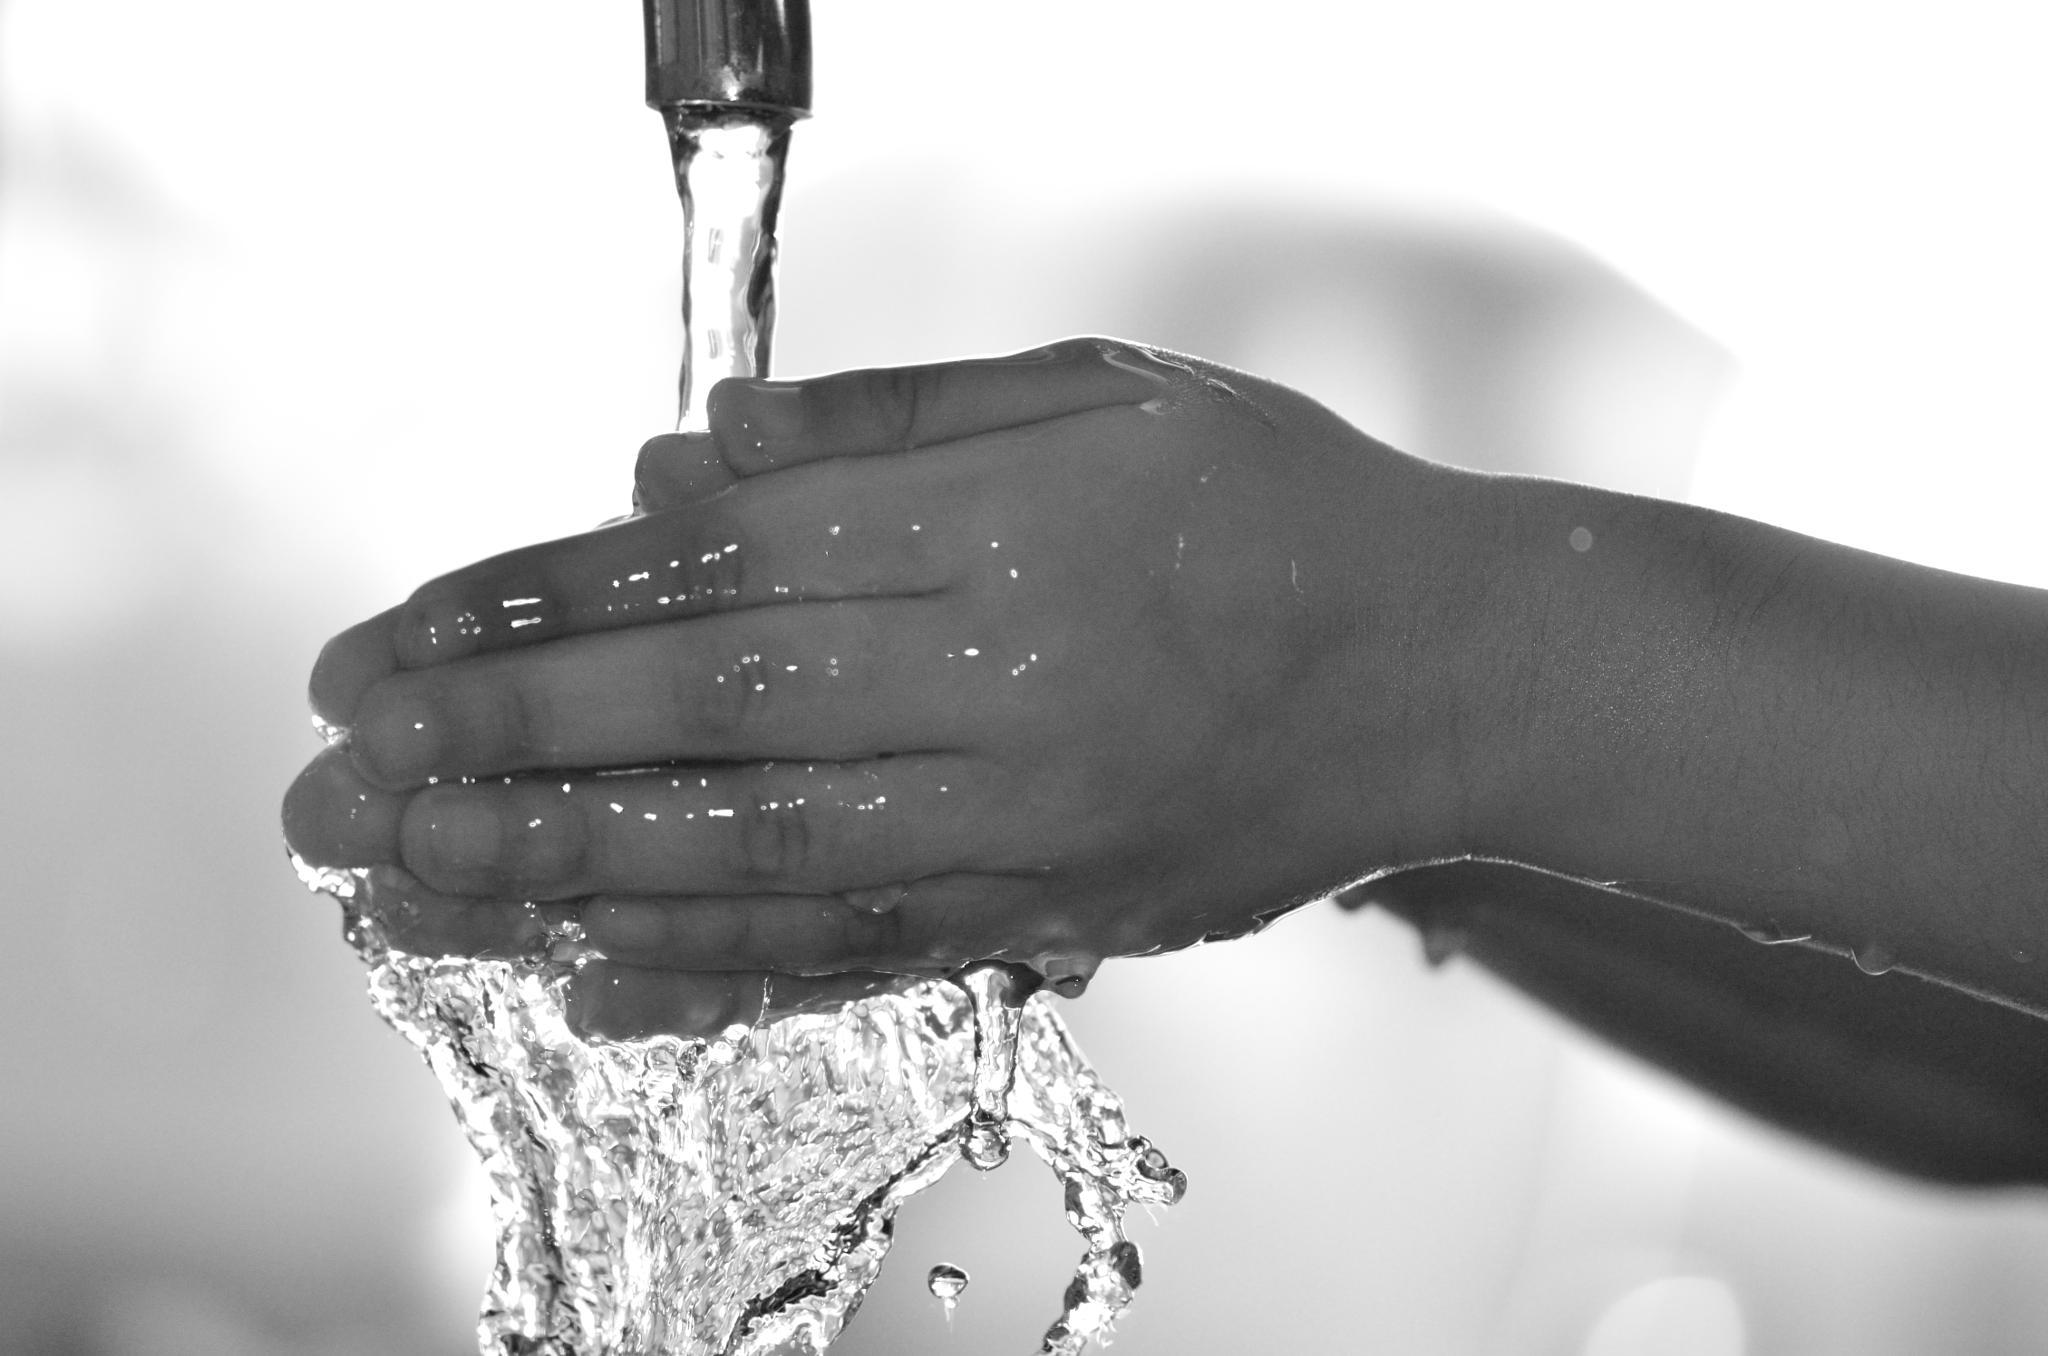 Wash Hands (High Key) by Yulius